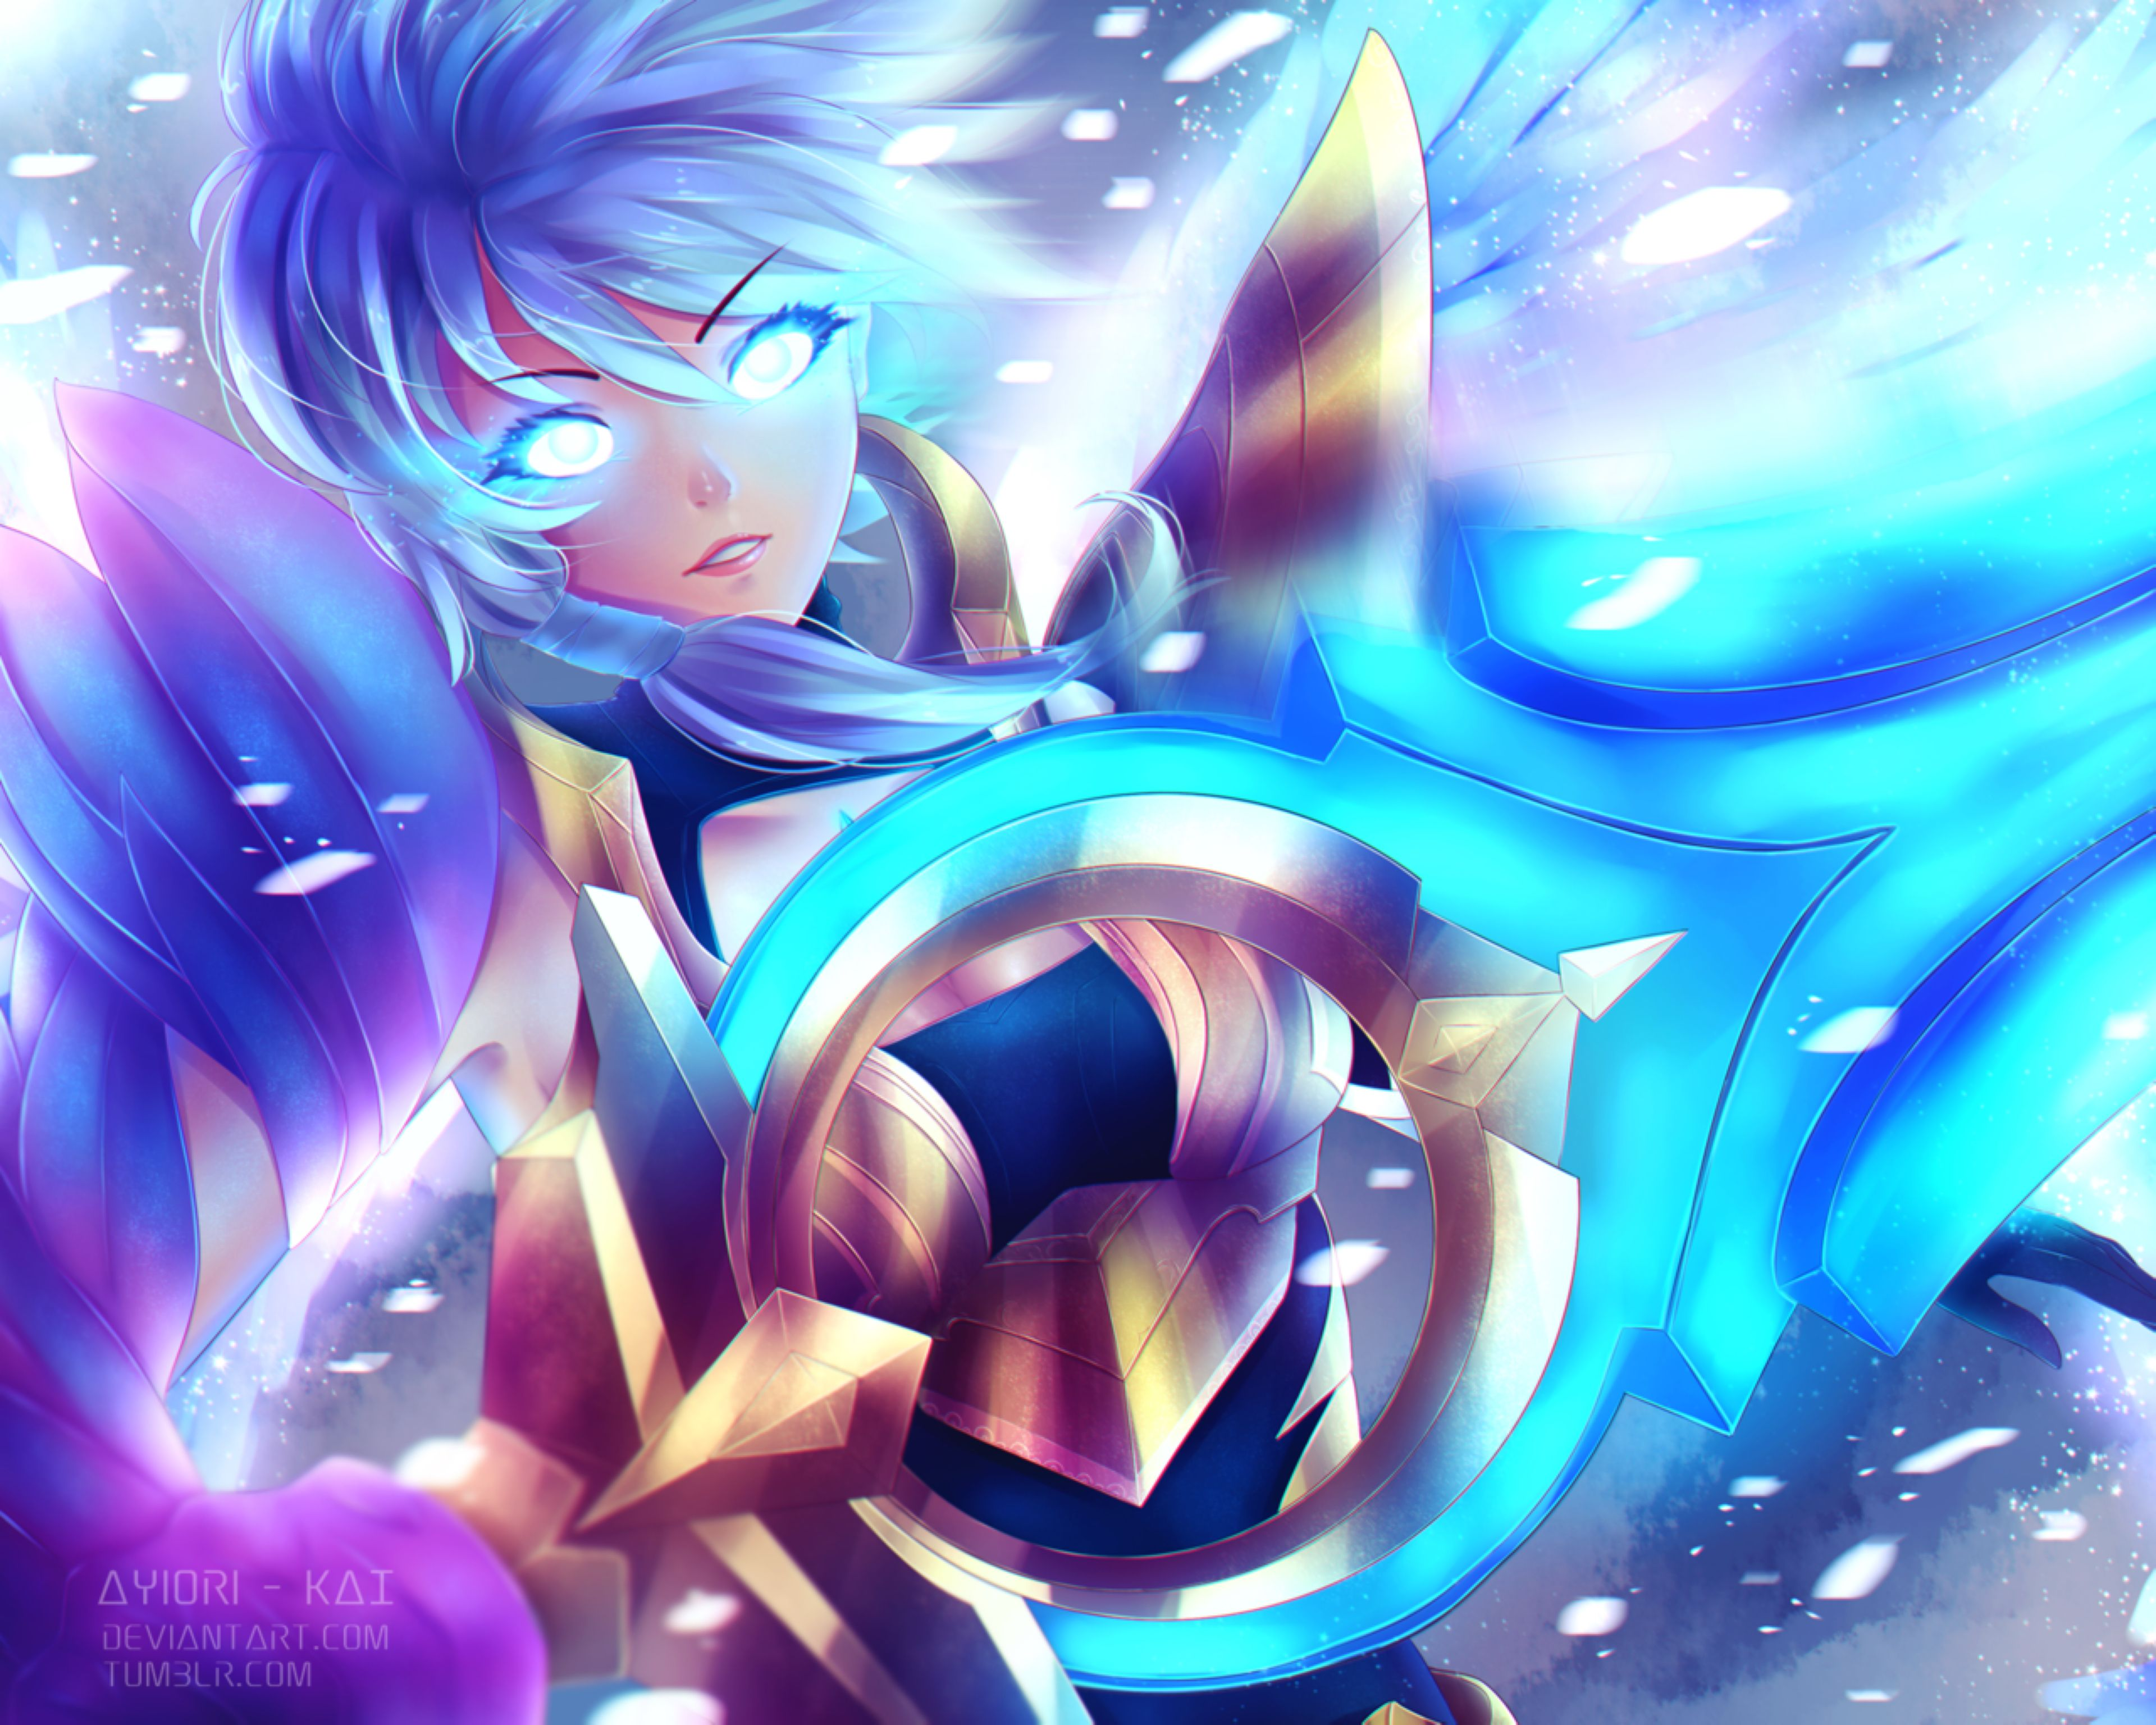 Dawnbringer Riven Fanart By Ayiori Kai On Deviantart Anime League Of Legends Characters Lol League Of Legends